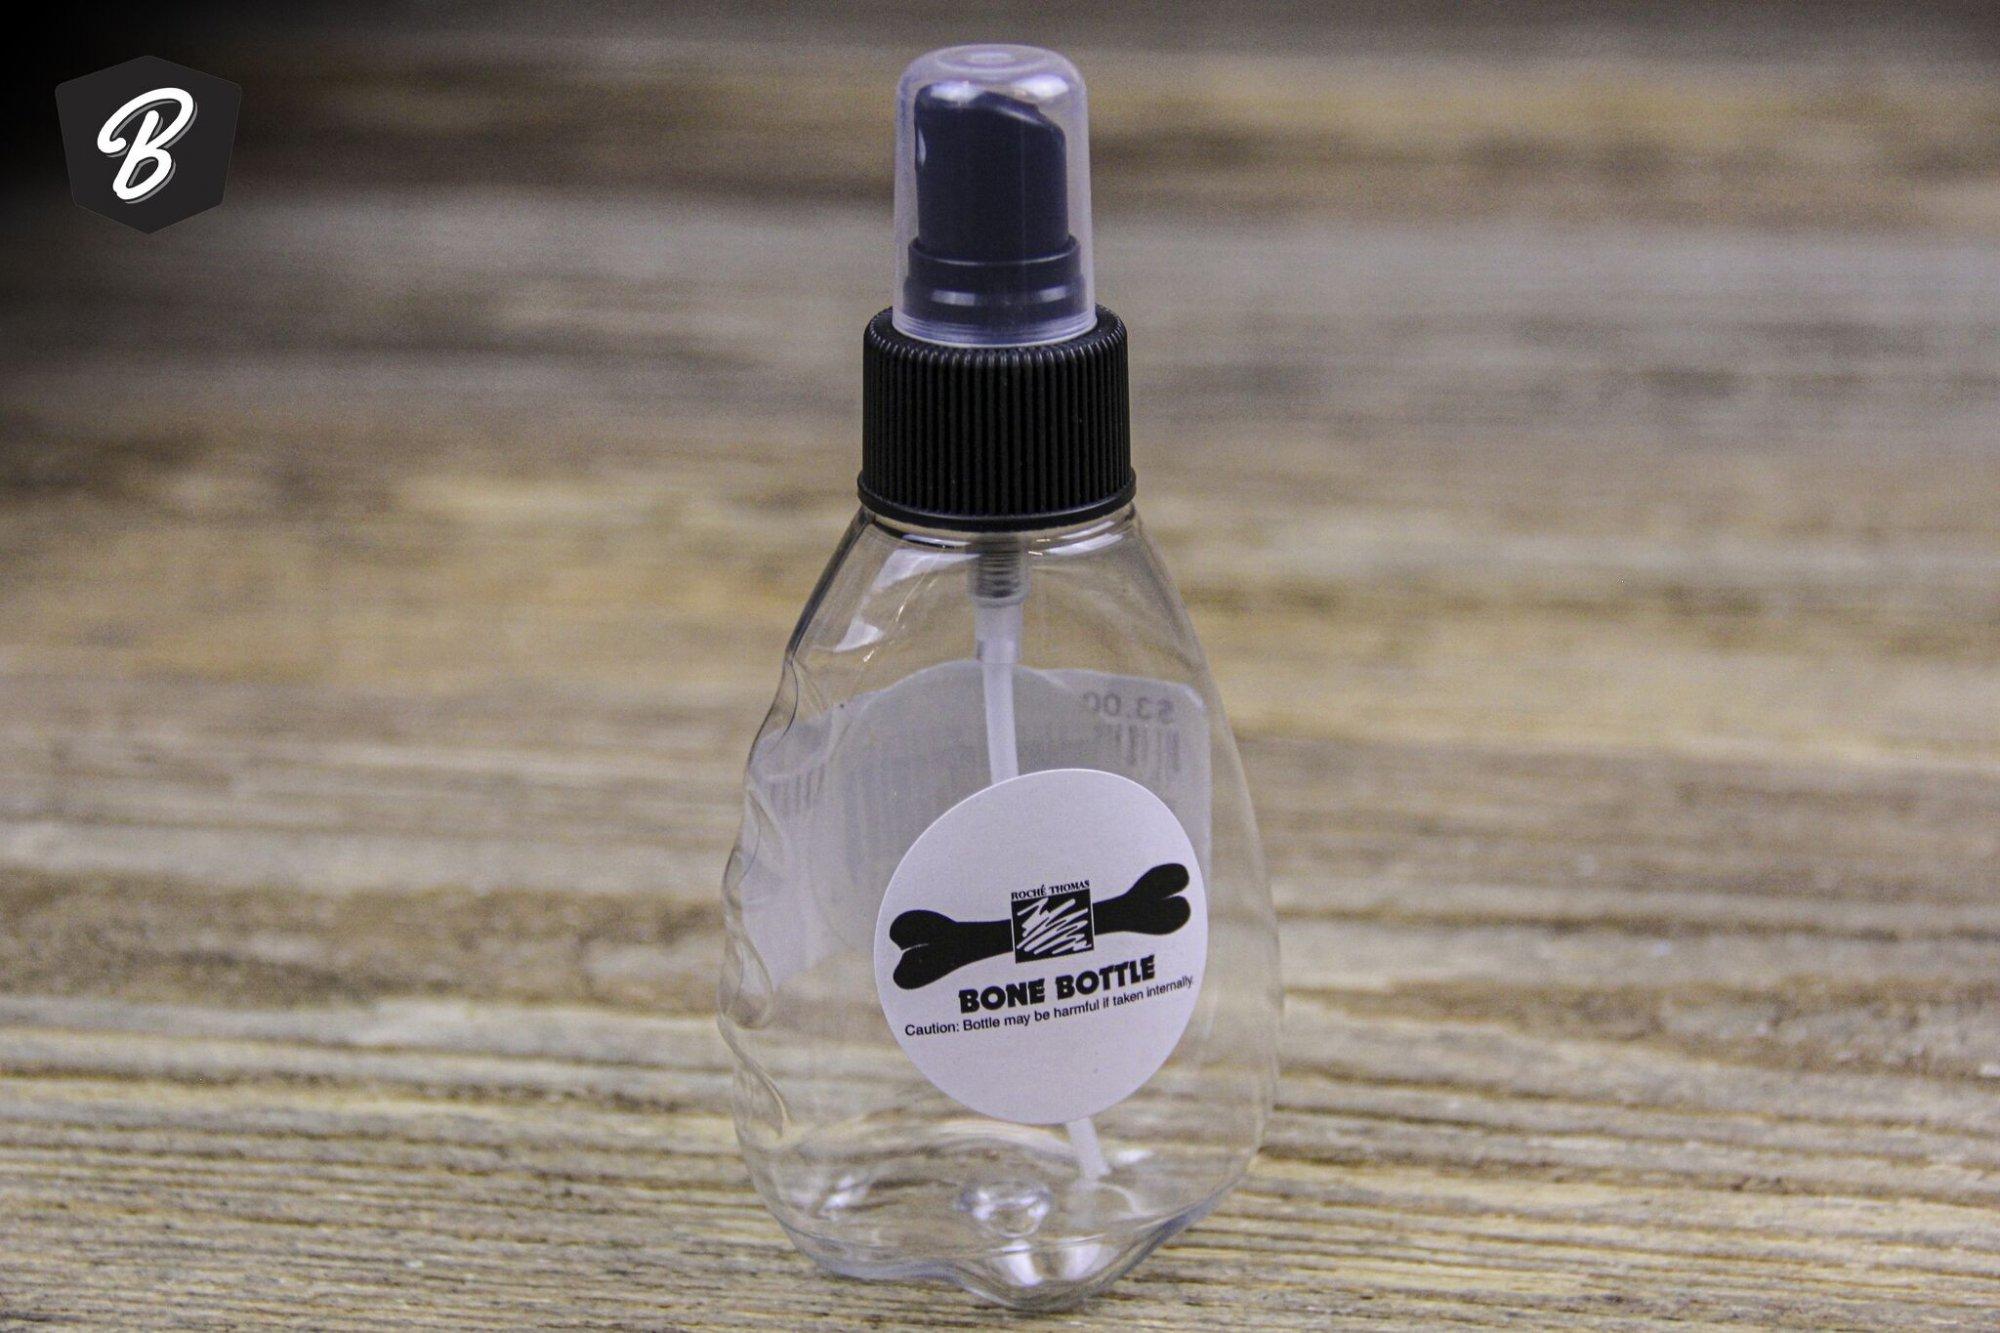 Roche' Thomas Bone Bottle Spray Bottle 4 oz.